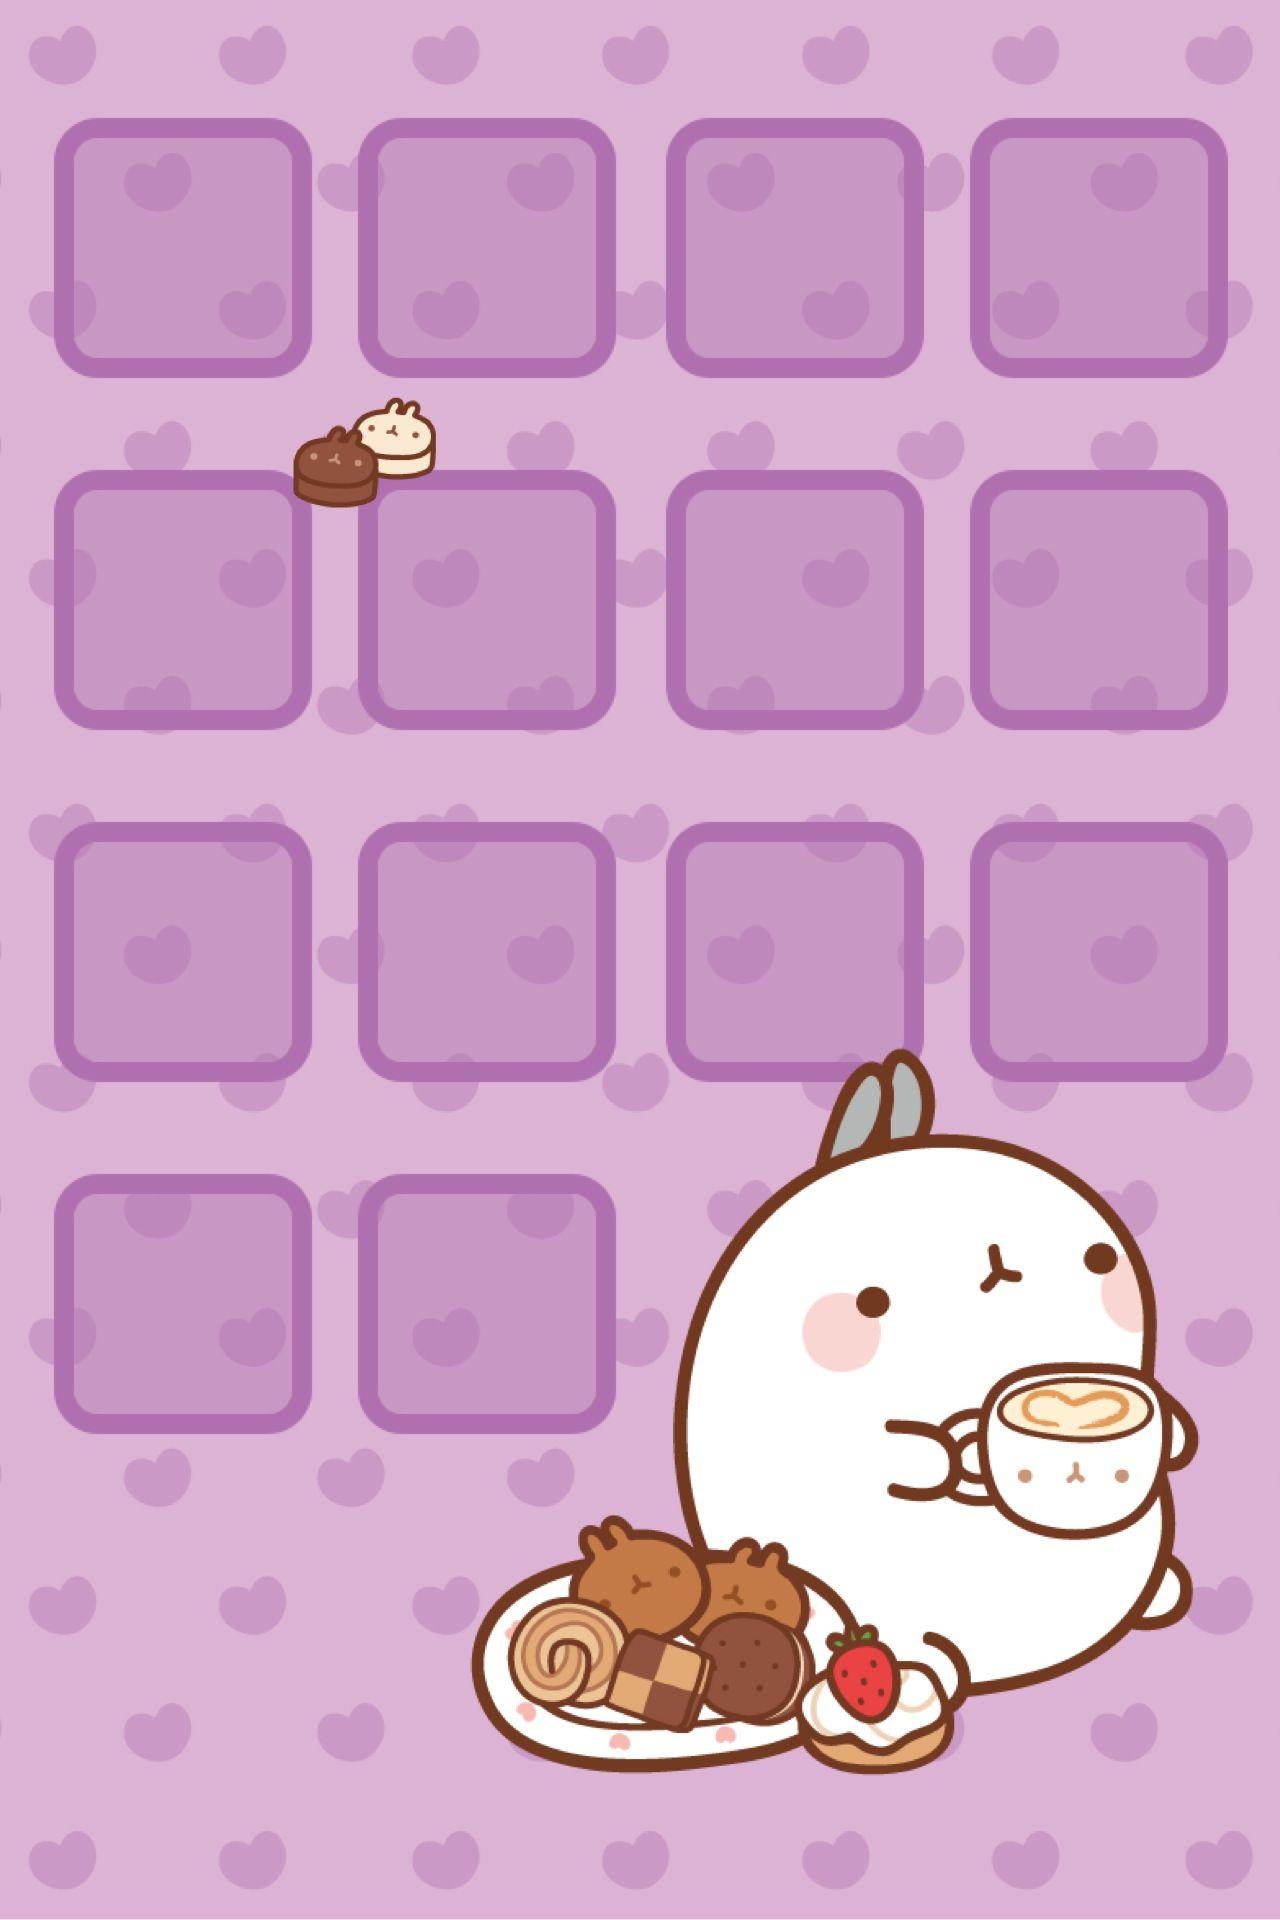 Kawaii iphone wallpaper tumblr - Kawaii Lock Image Google Search